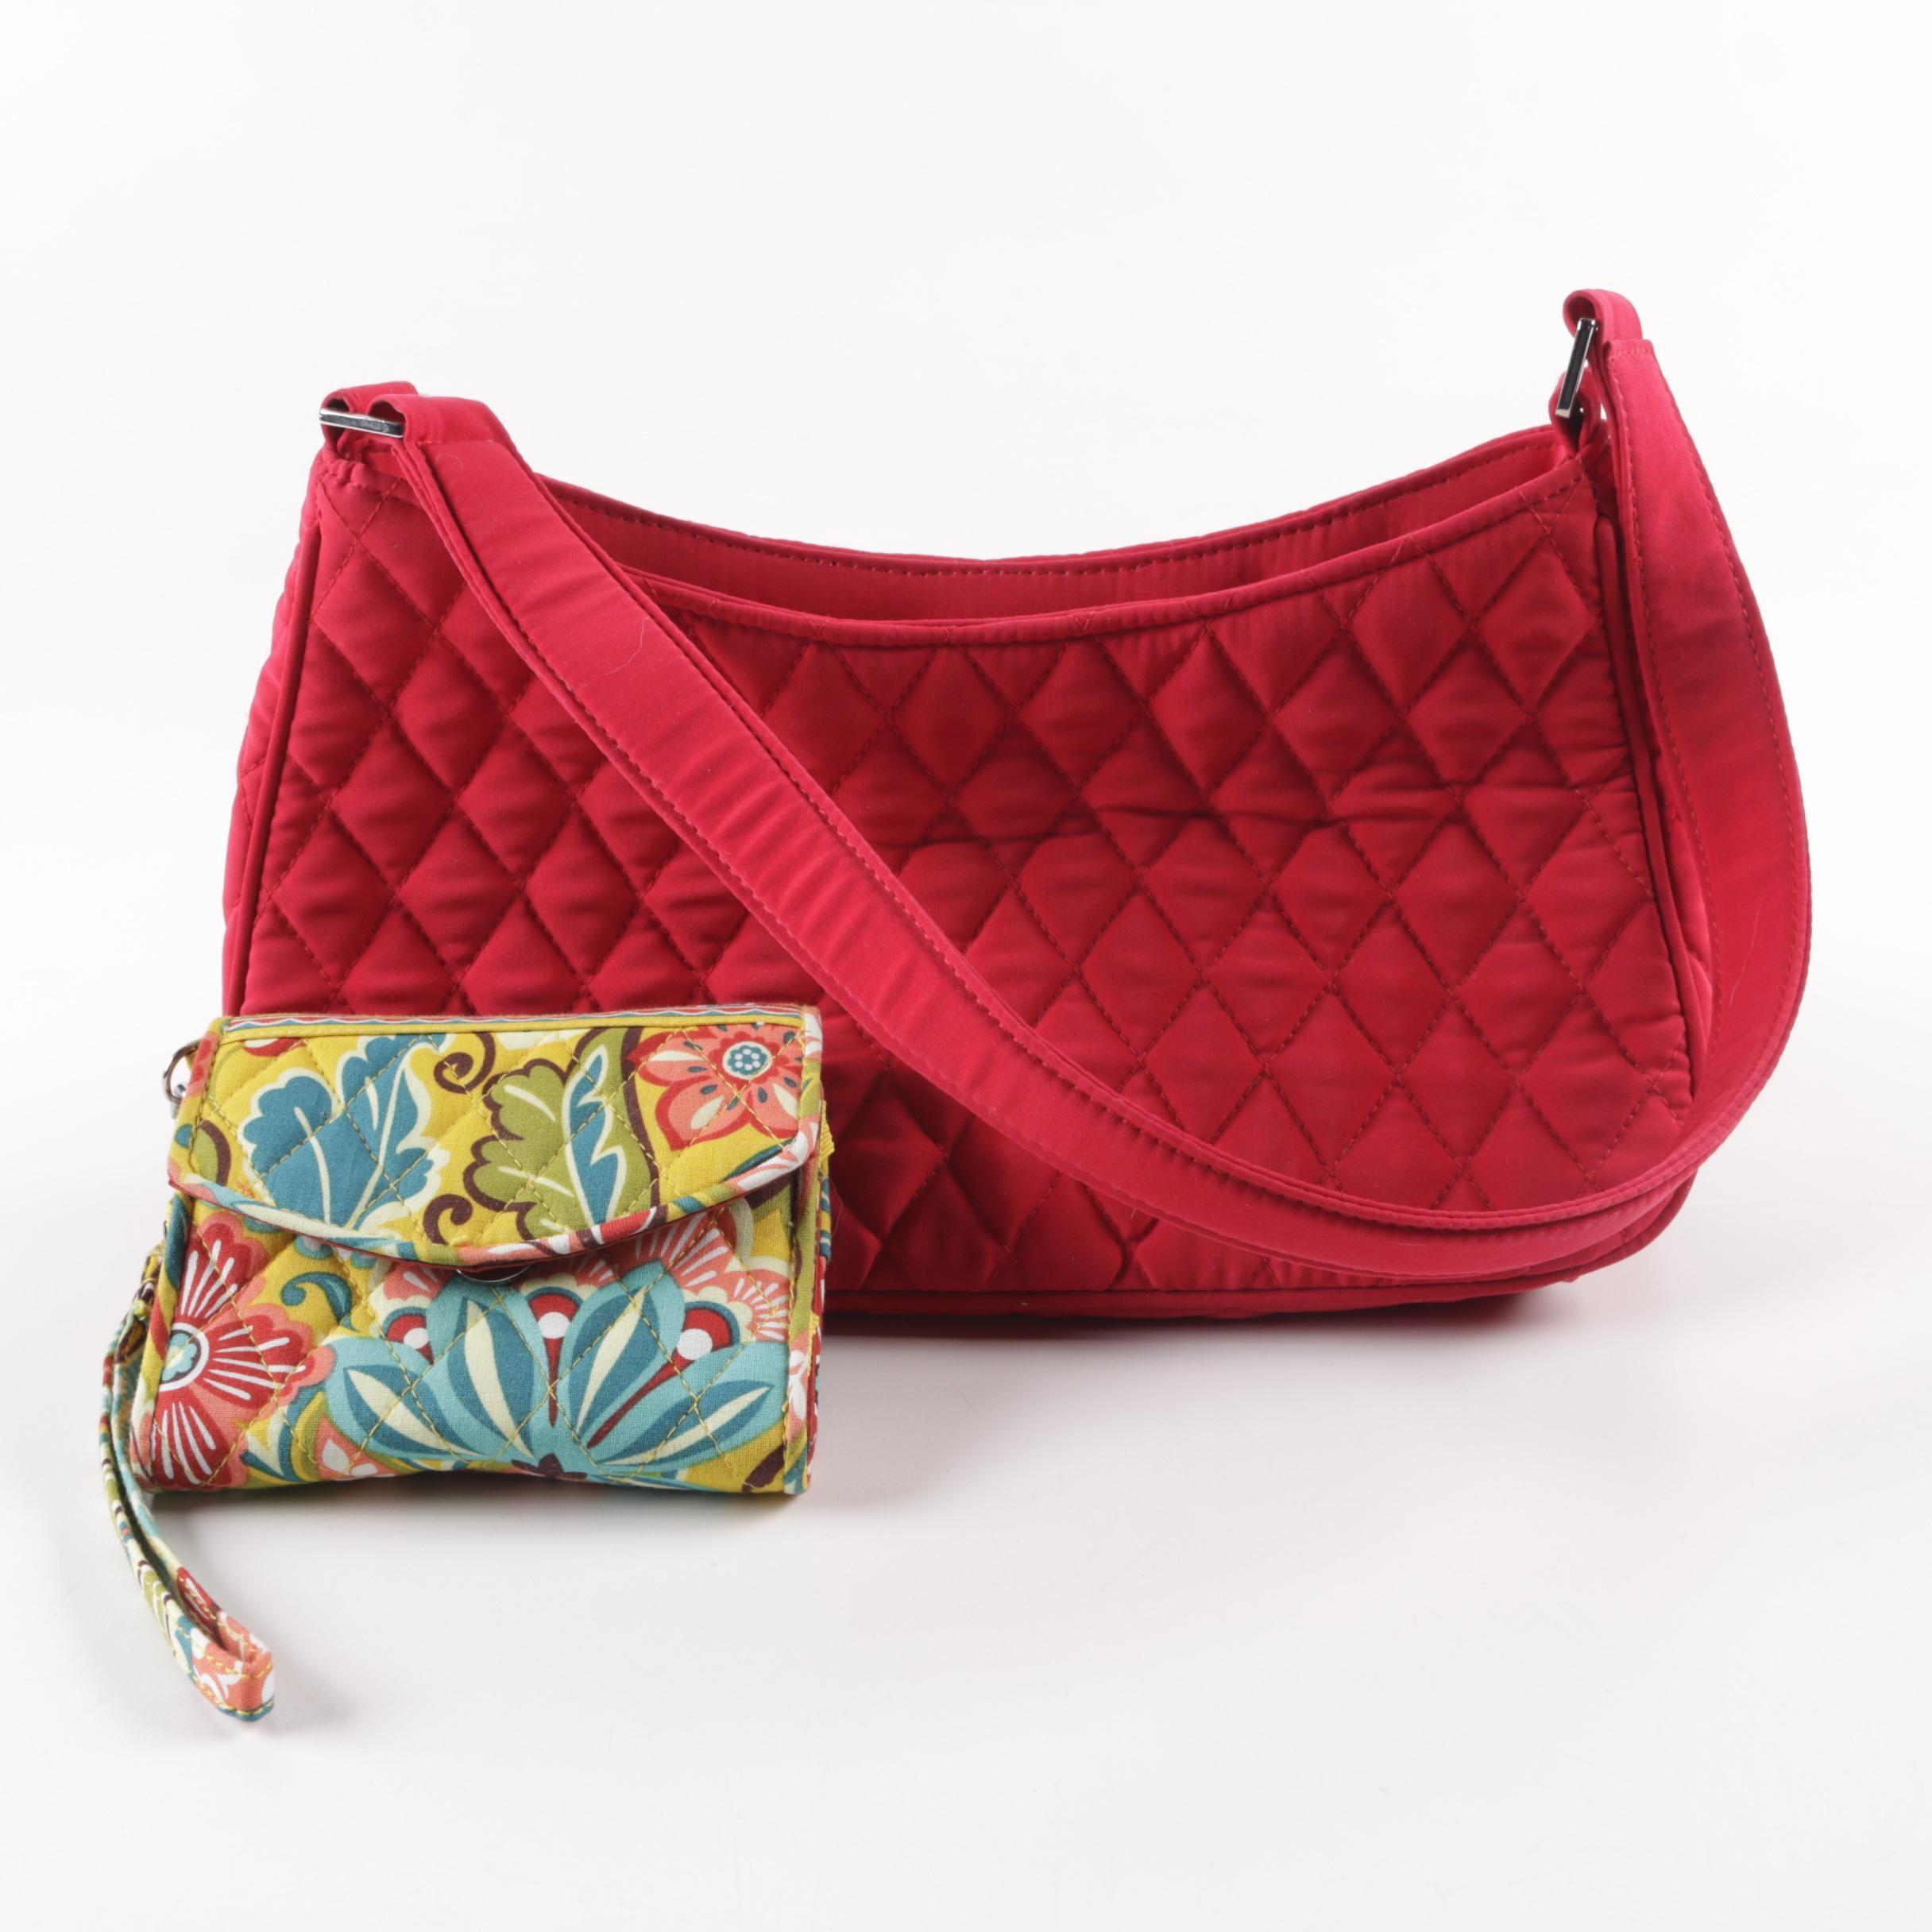 Vera Bradley Handbag and Wallet